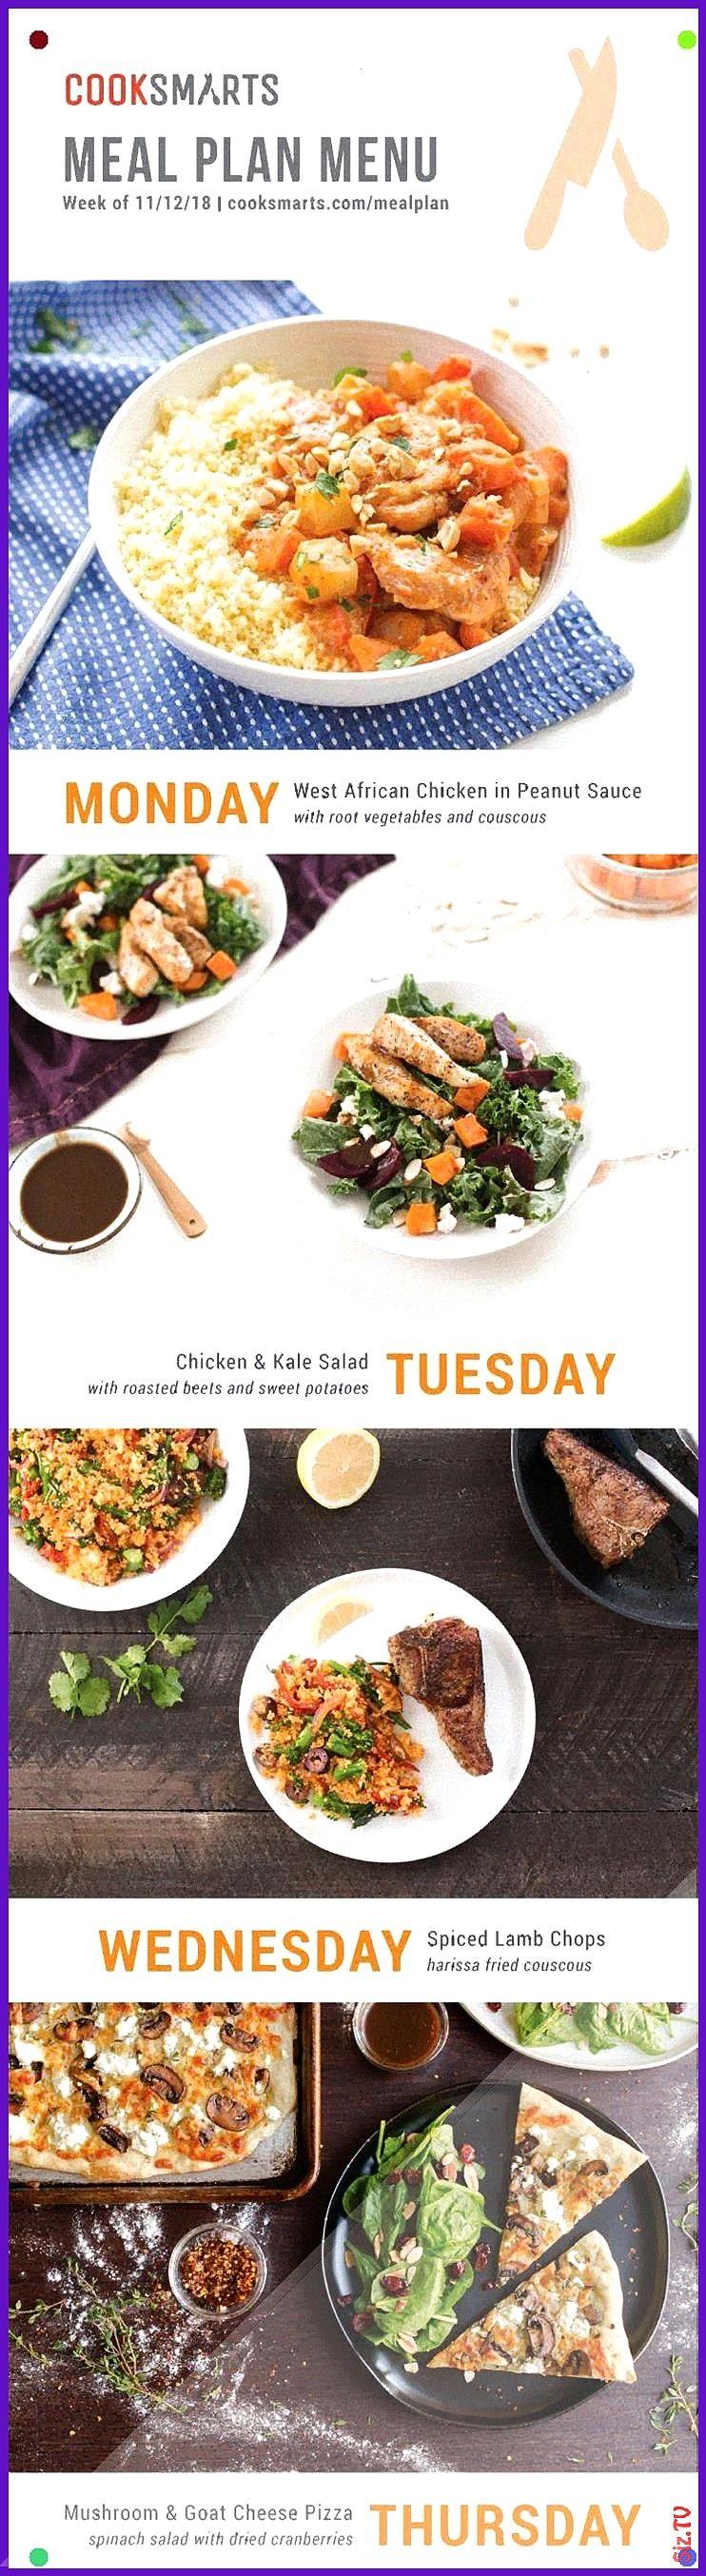 Meal Planner Menu For Week Of 111218 Via Cook Smarts Healthy Meal Plan Menu Global Recipes Meal Plan Service Food Around The World Get Ou Weekly Meal Planner Menu For Wee...